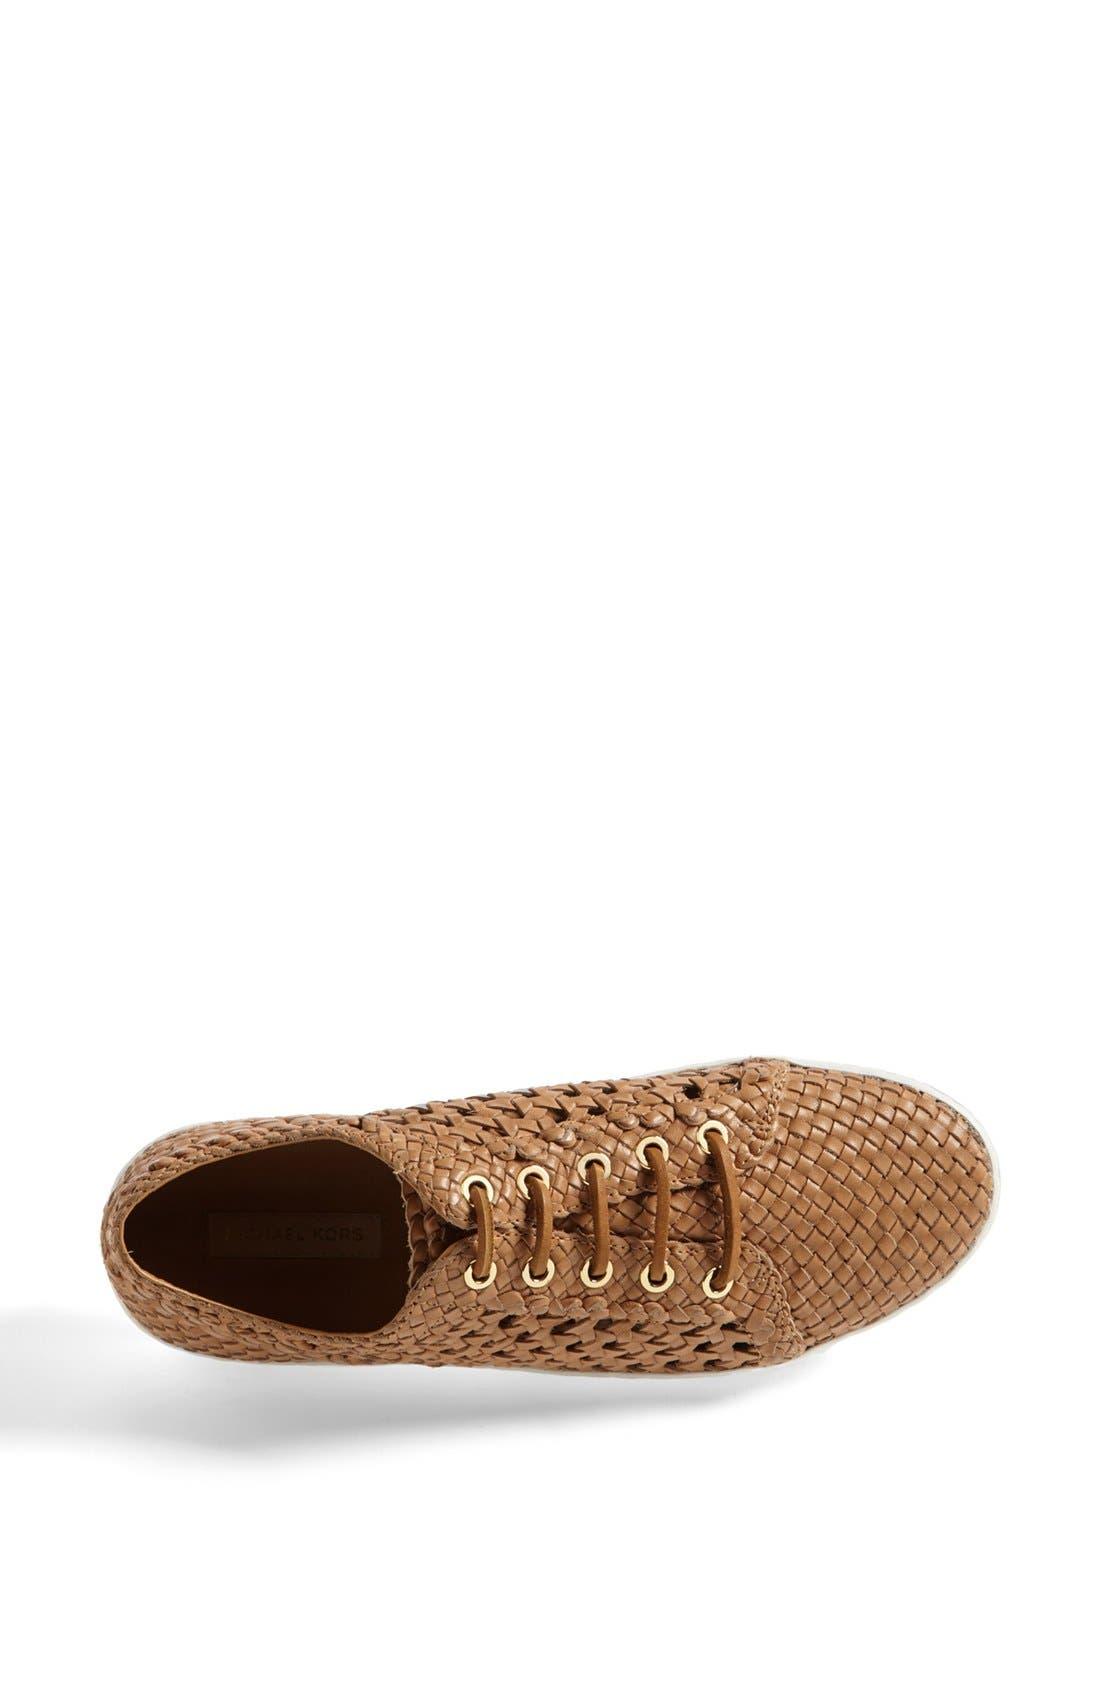 Alternate Image 3  - Michael Kors 'Violet' Sneaker (Online Only)